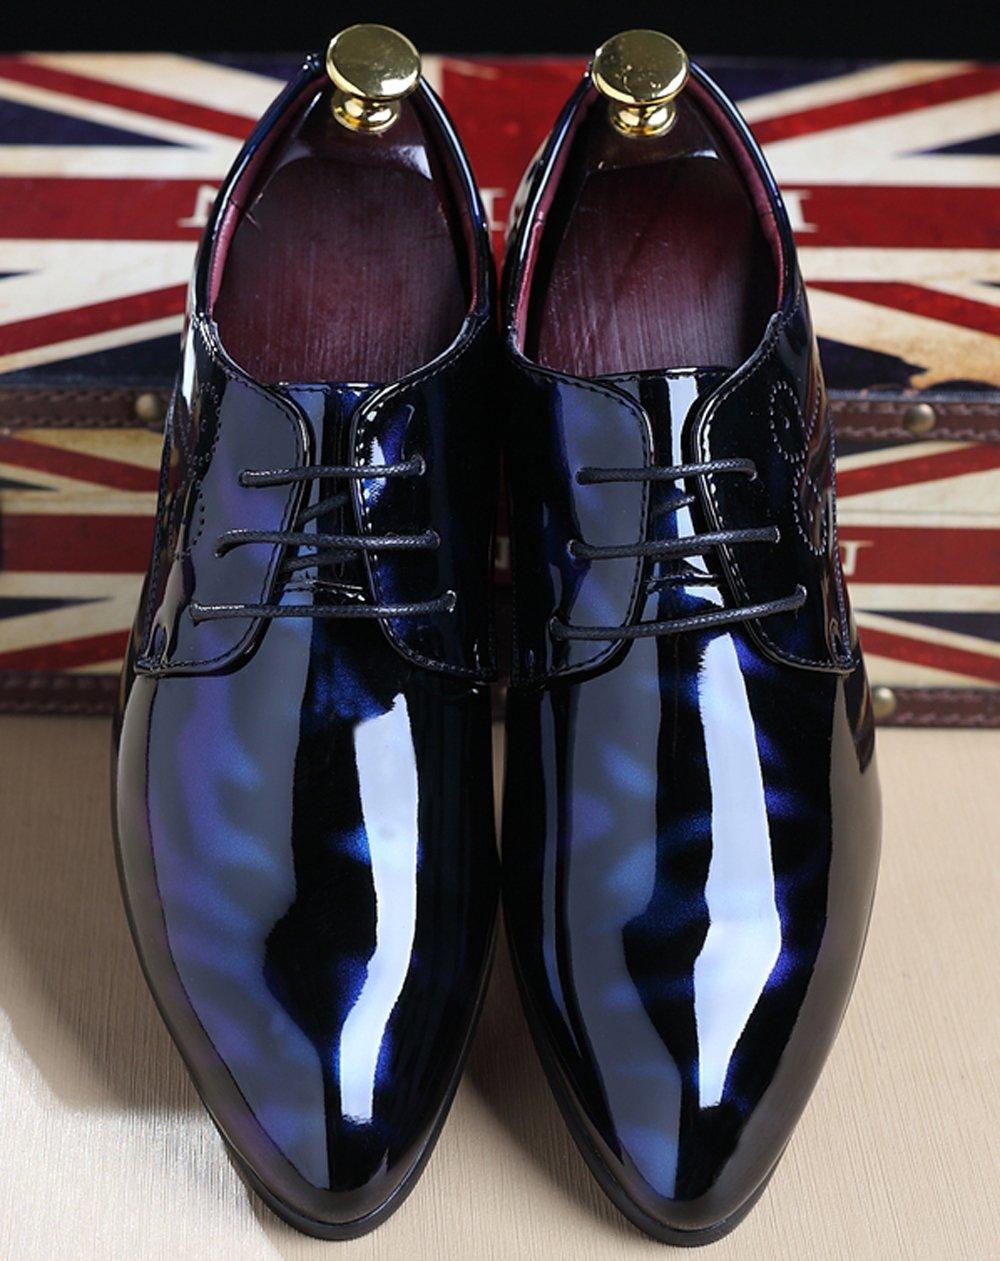 dde0cd78688d Santimon Black Dress Shoes for Men Pointed Toe Floral Patent Leather Lace  up Oxford Black Blue